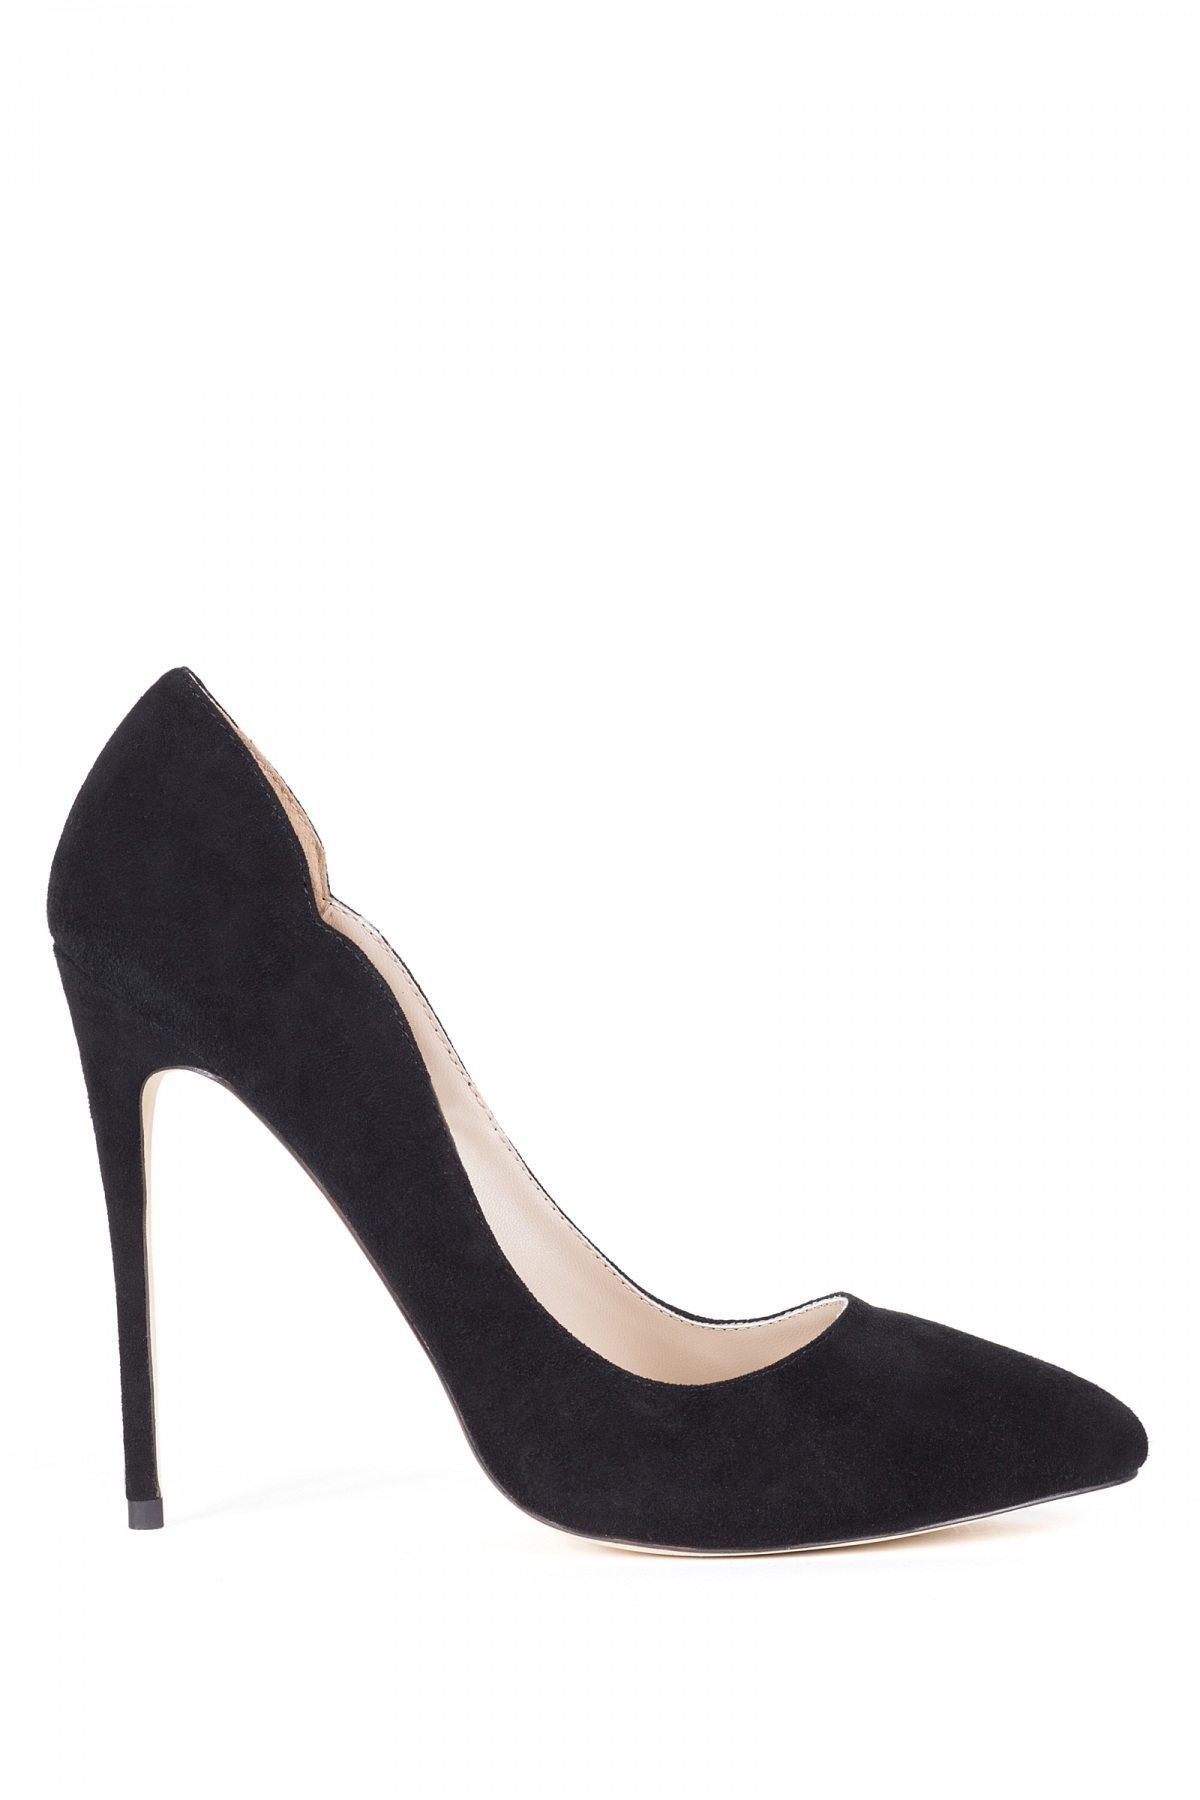 Pantofi stiletto negri Negru